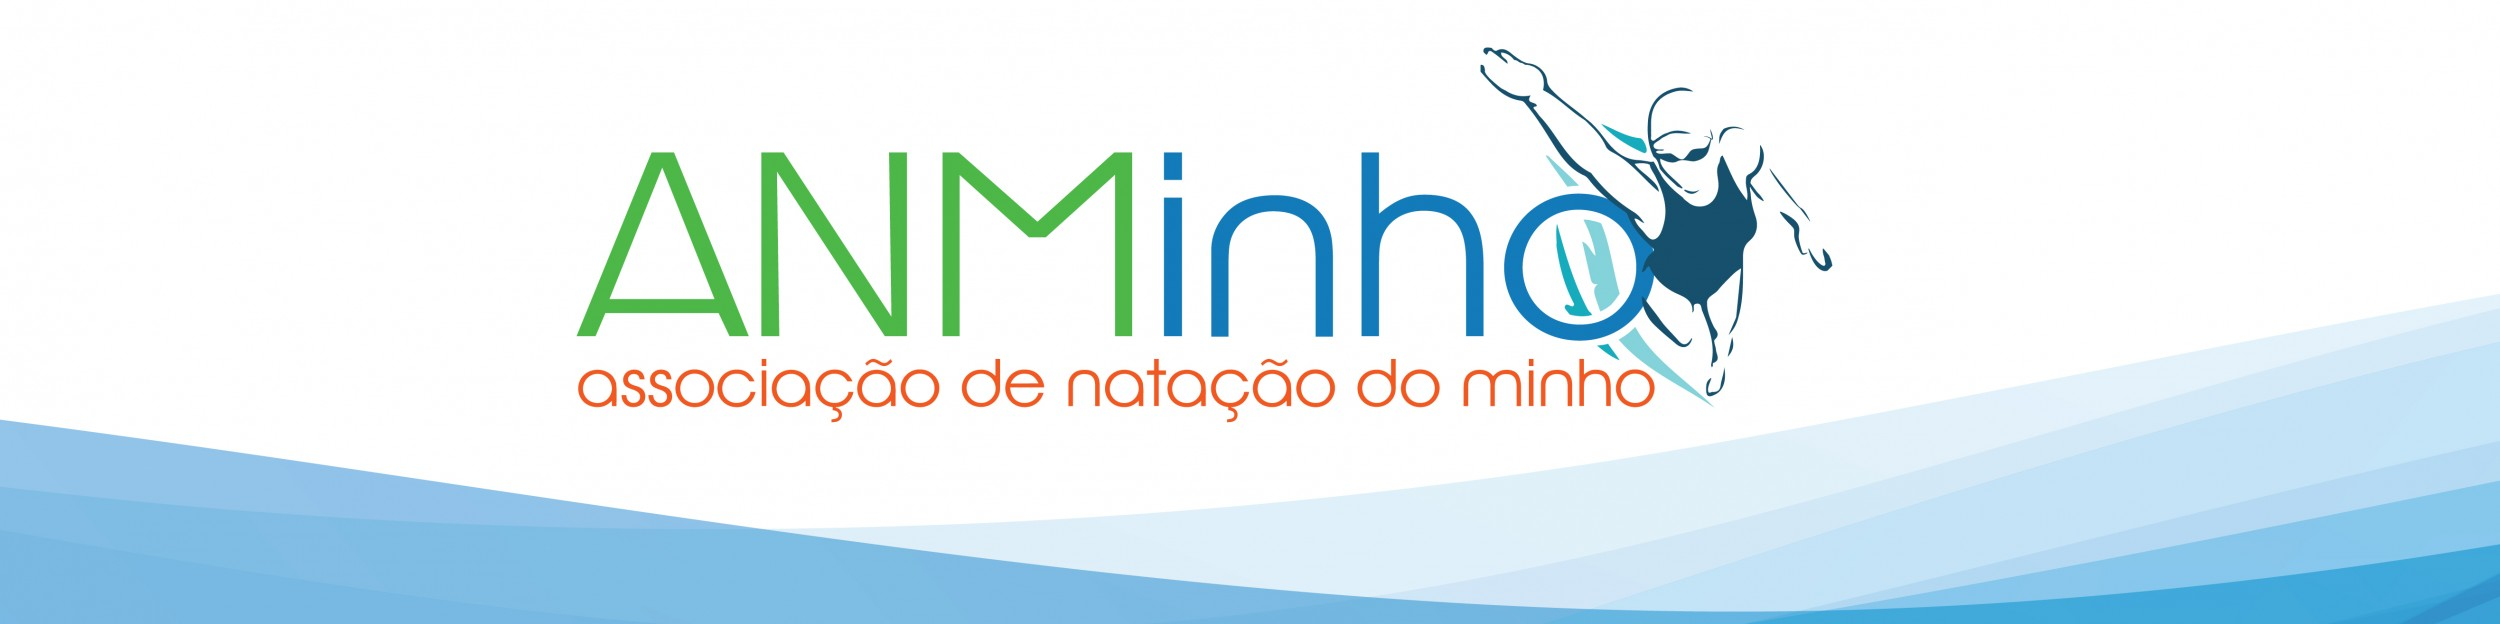 ANMinho